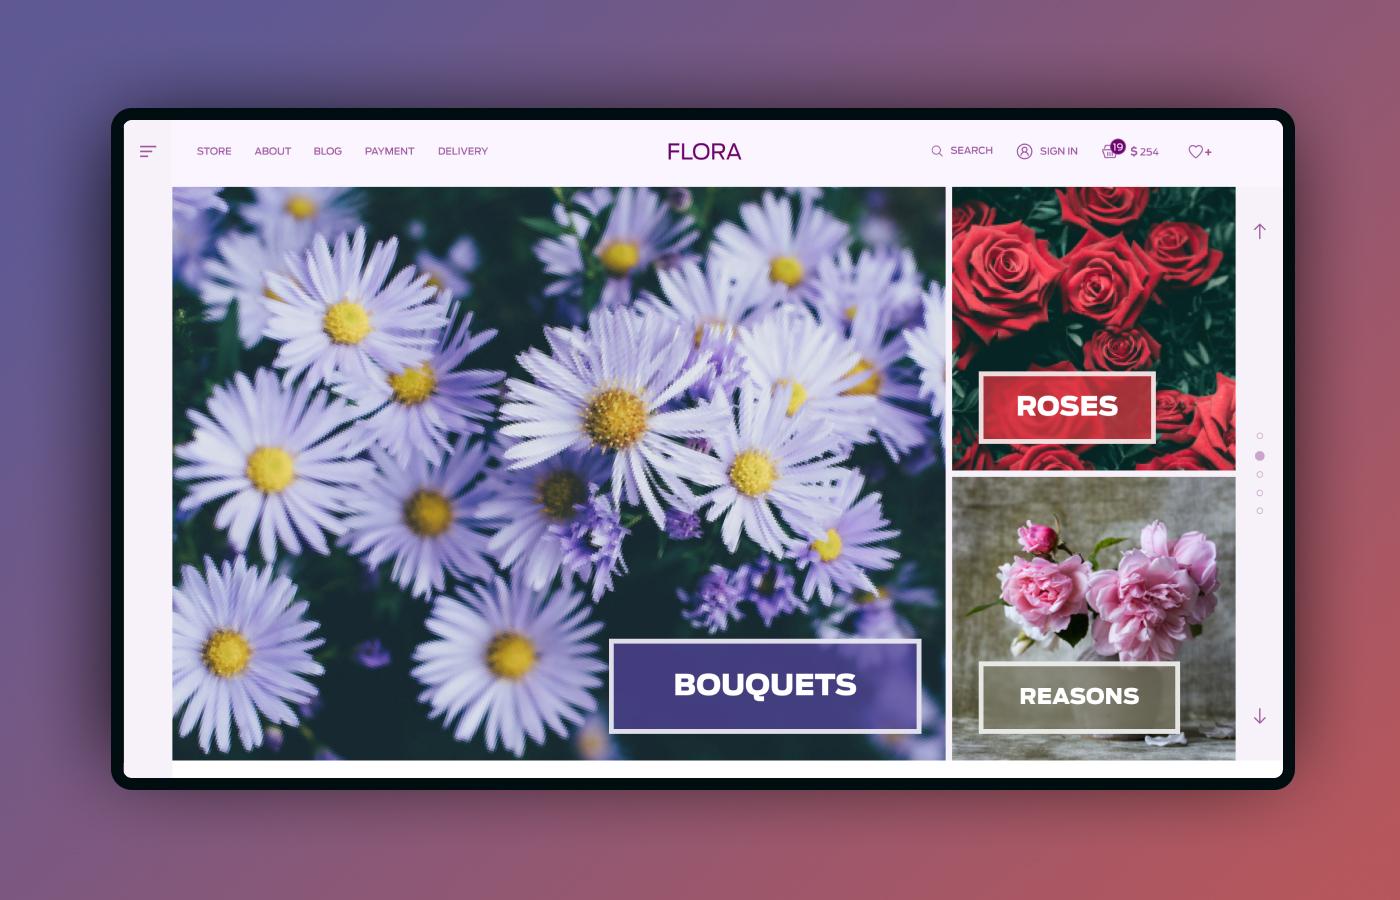 FLORA - Flower Delivery